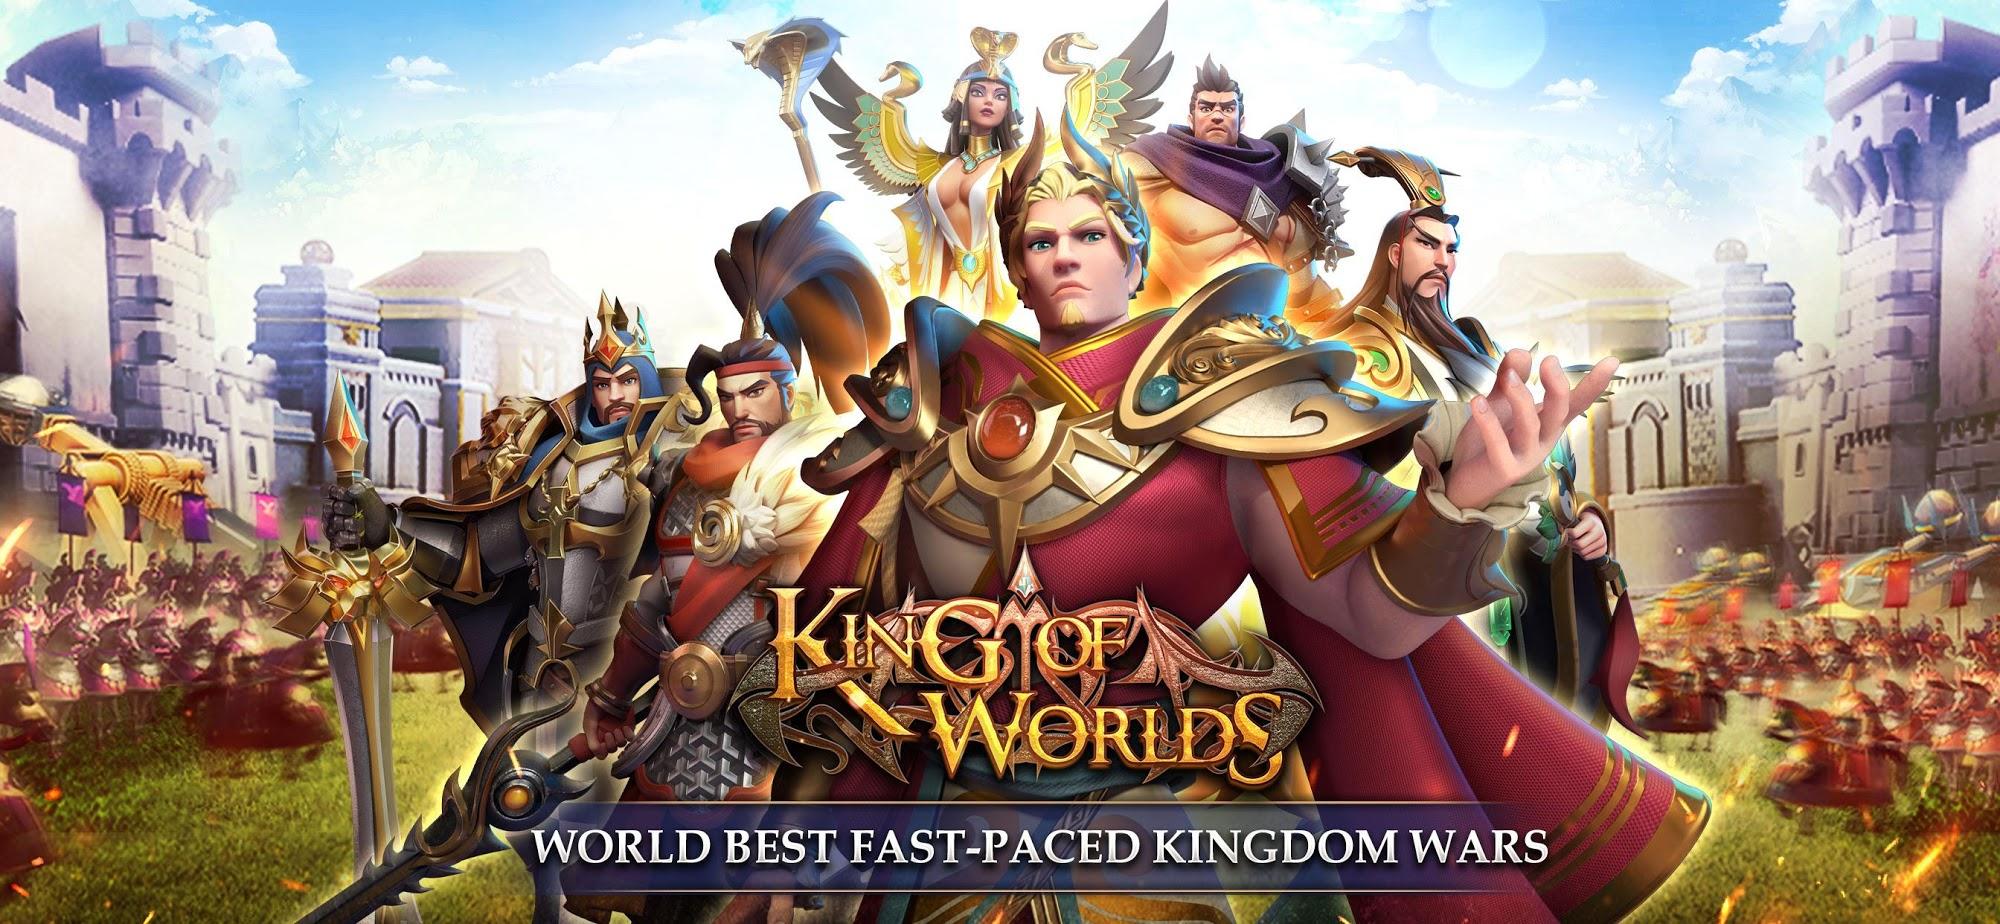 King of Worlds スクリーンショット1